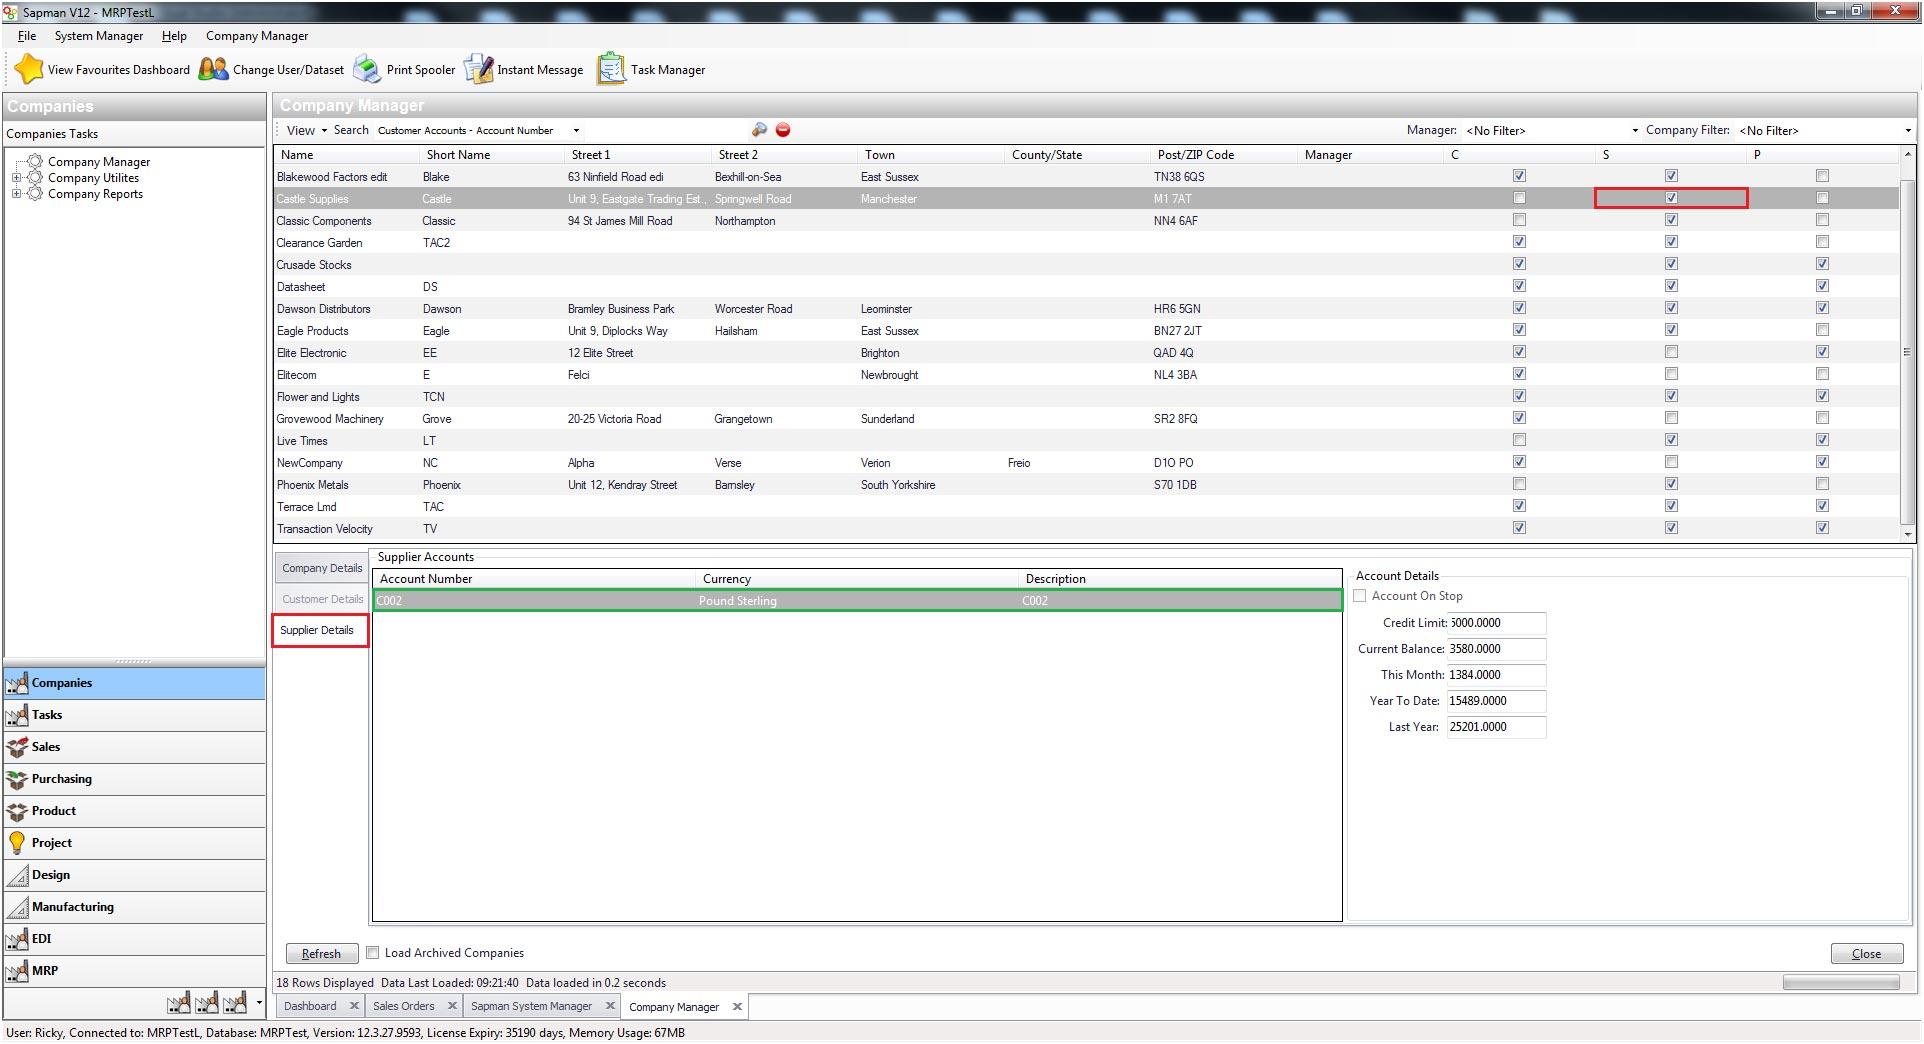 Sapman v12 Supplier Details screen